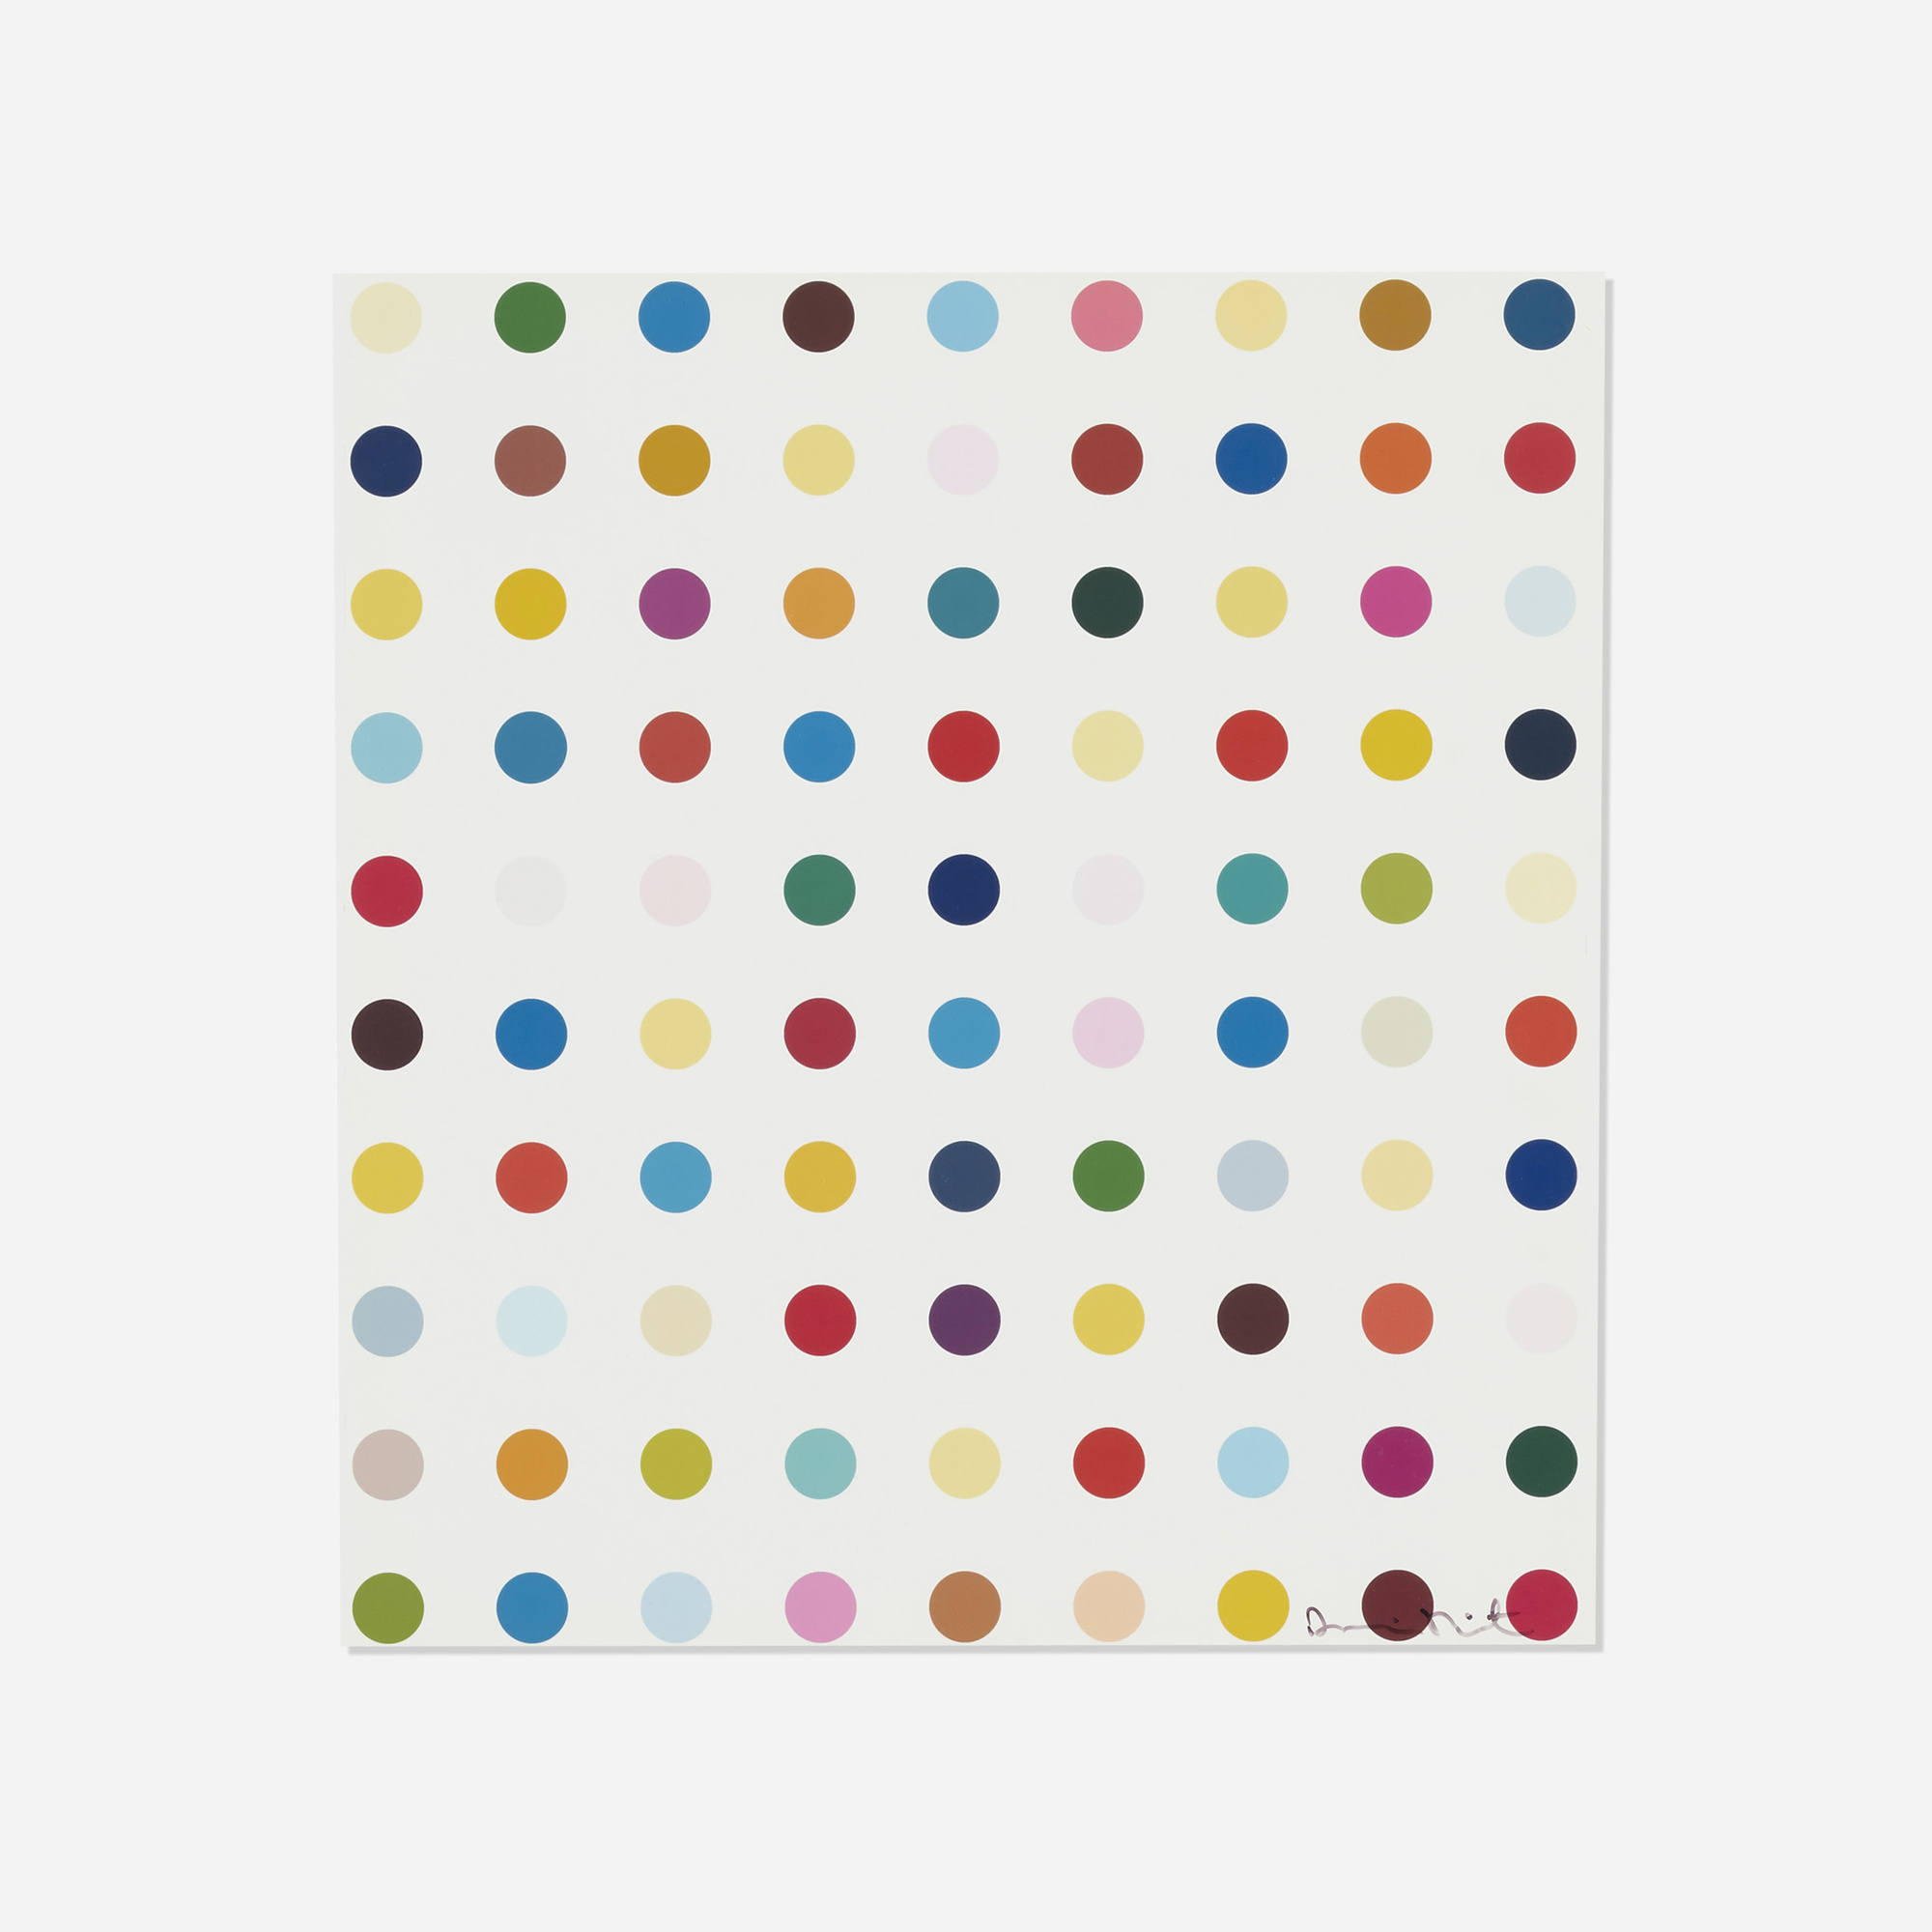 107: Damien Hirst / Opium (1 of 1)